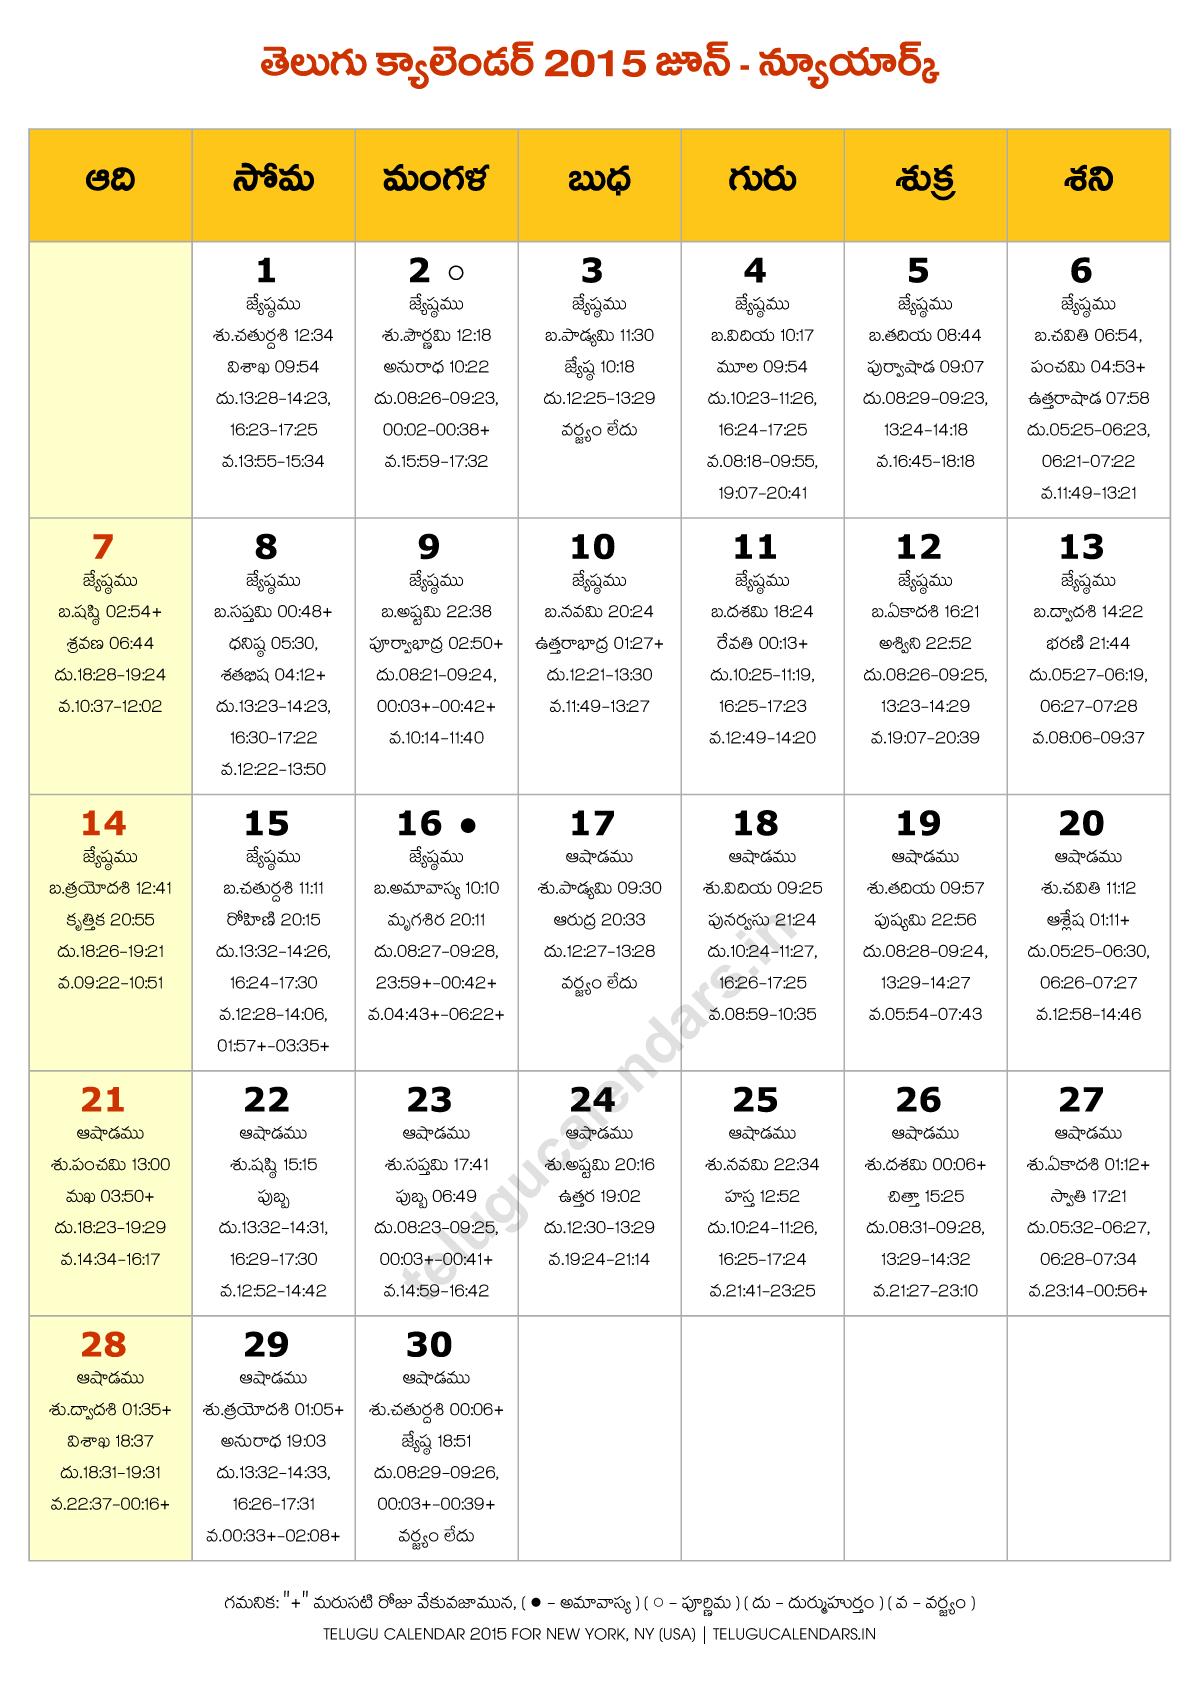 Print Julian Calendar 2015 Quadax | Printable Calendar Template